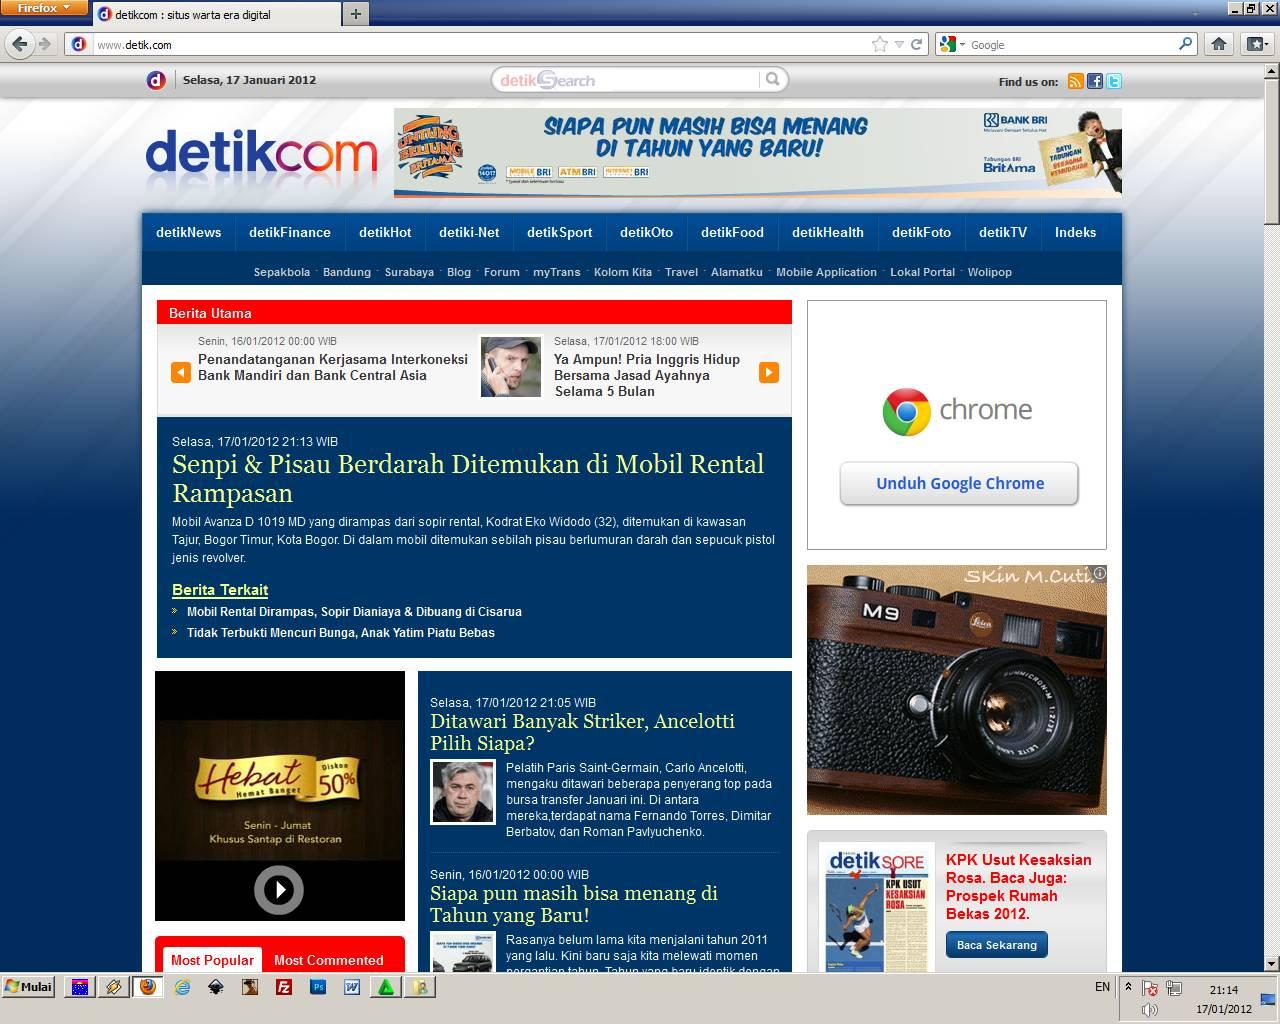 detikCom - Wikiwand